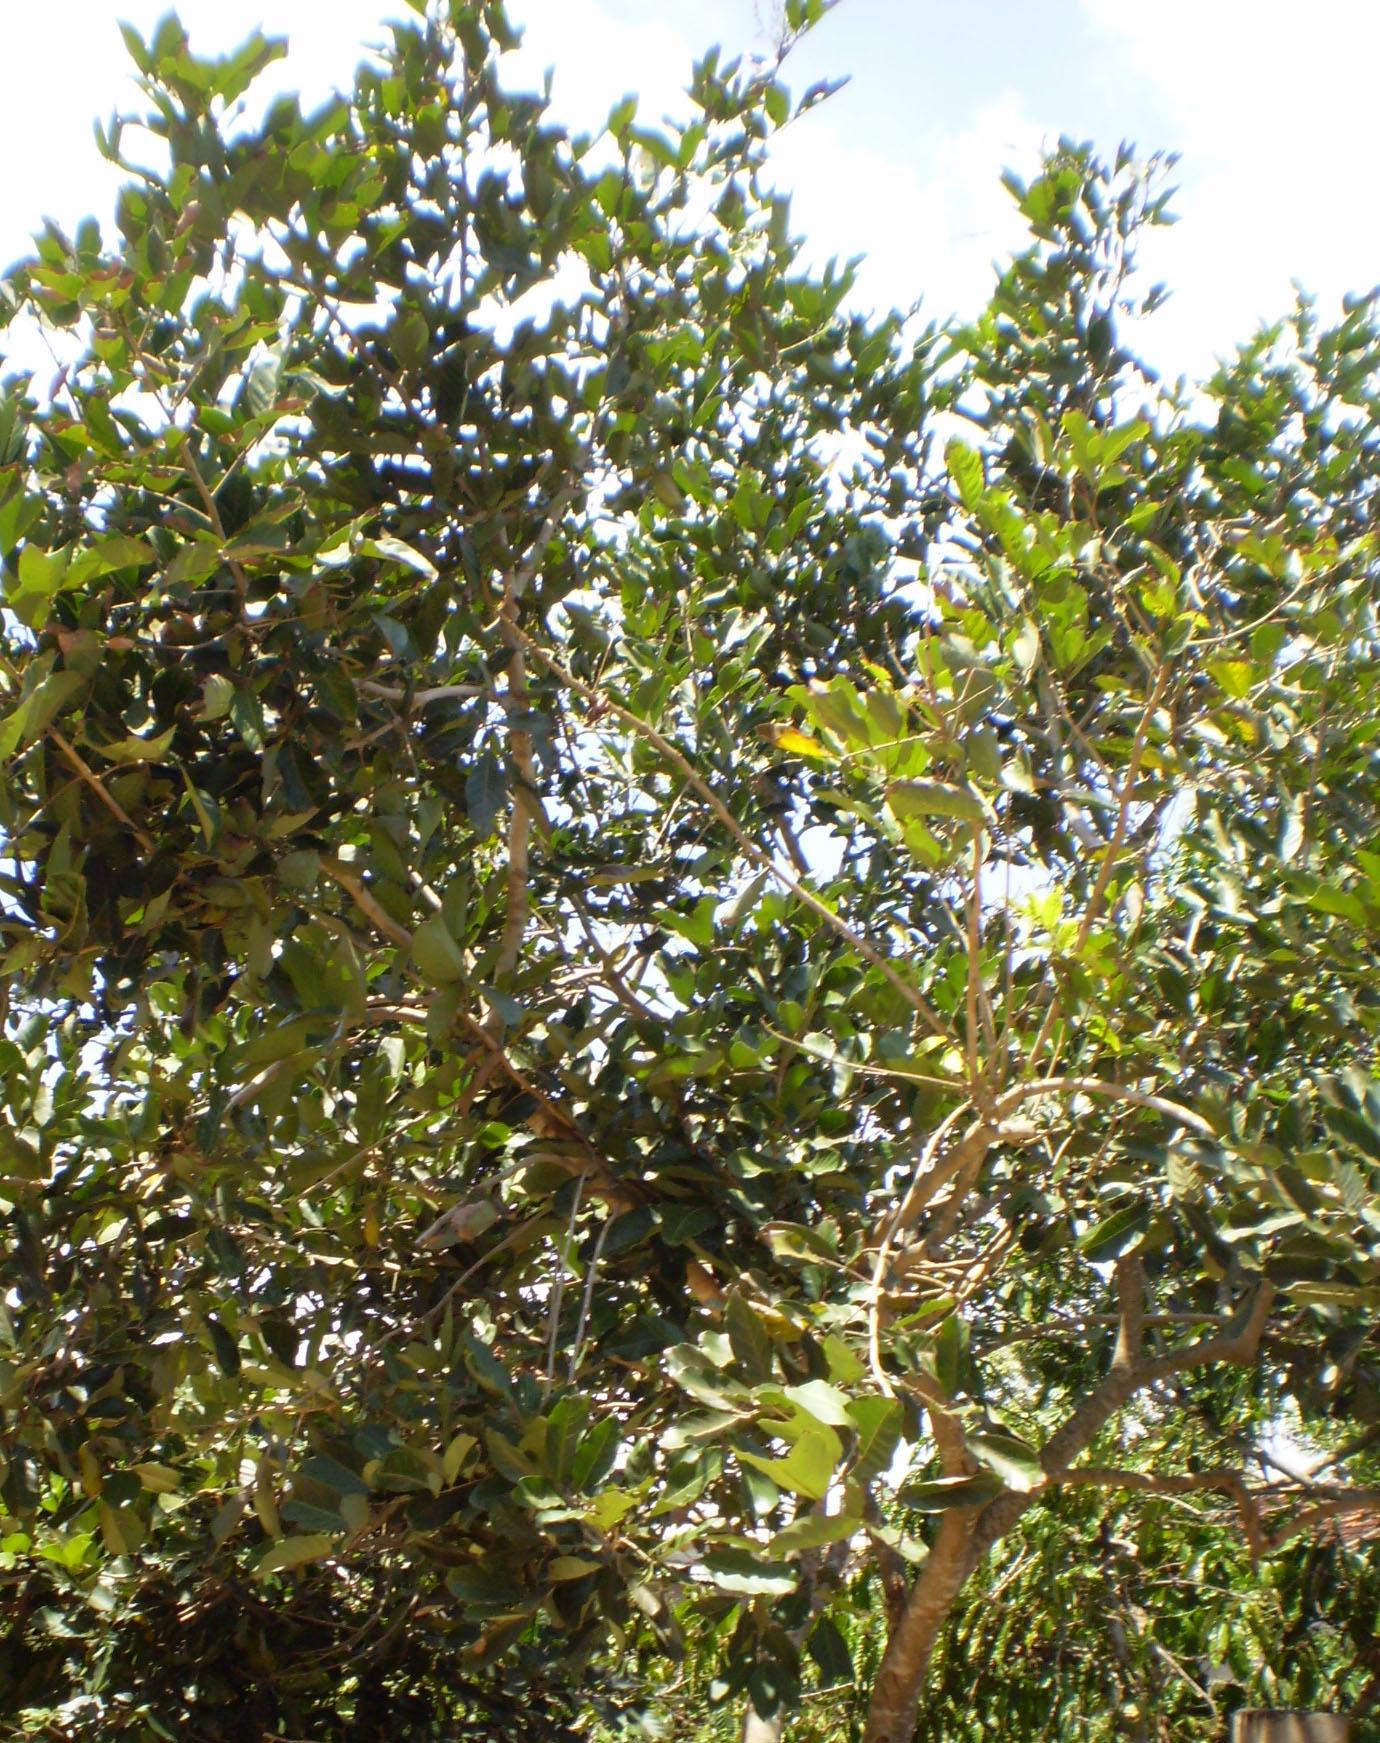 File:Rambutan tree.jpg - Wikimedia Commons